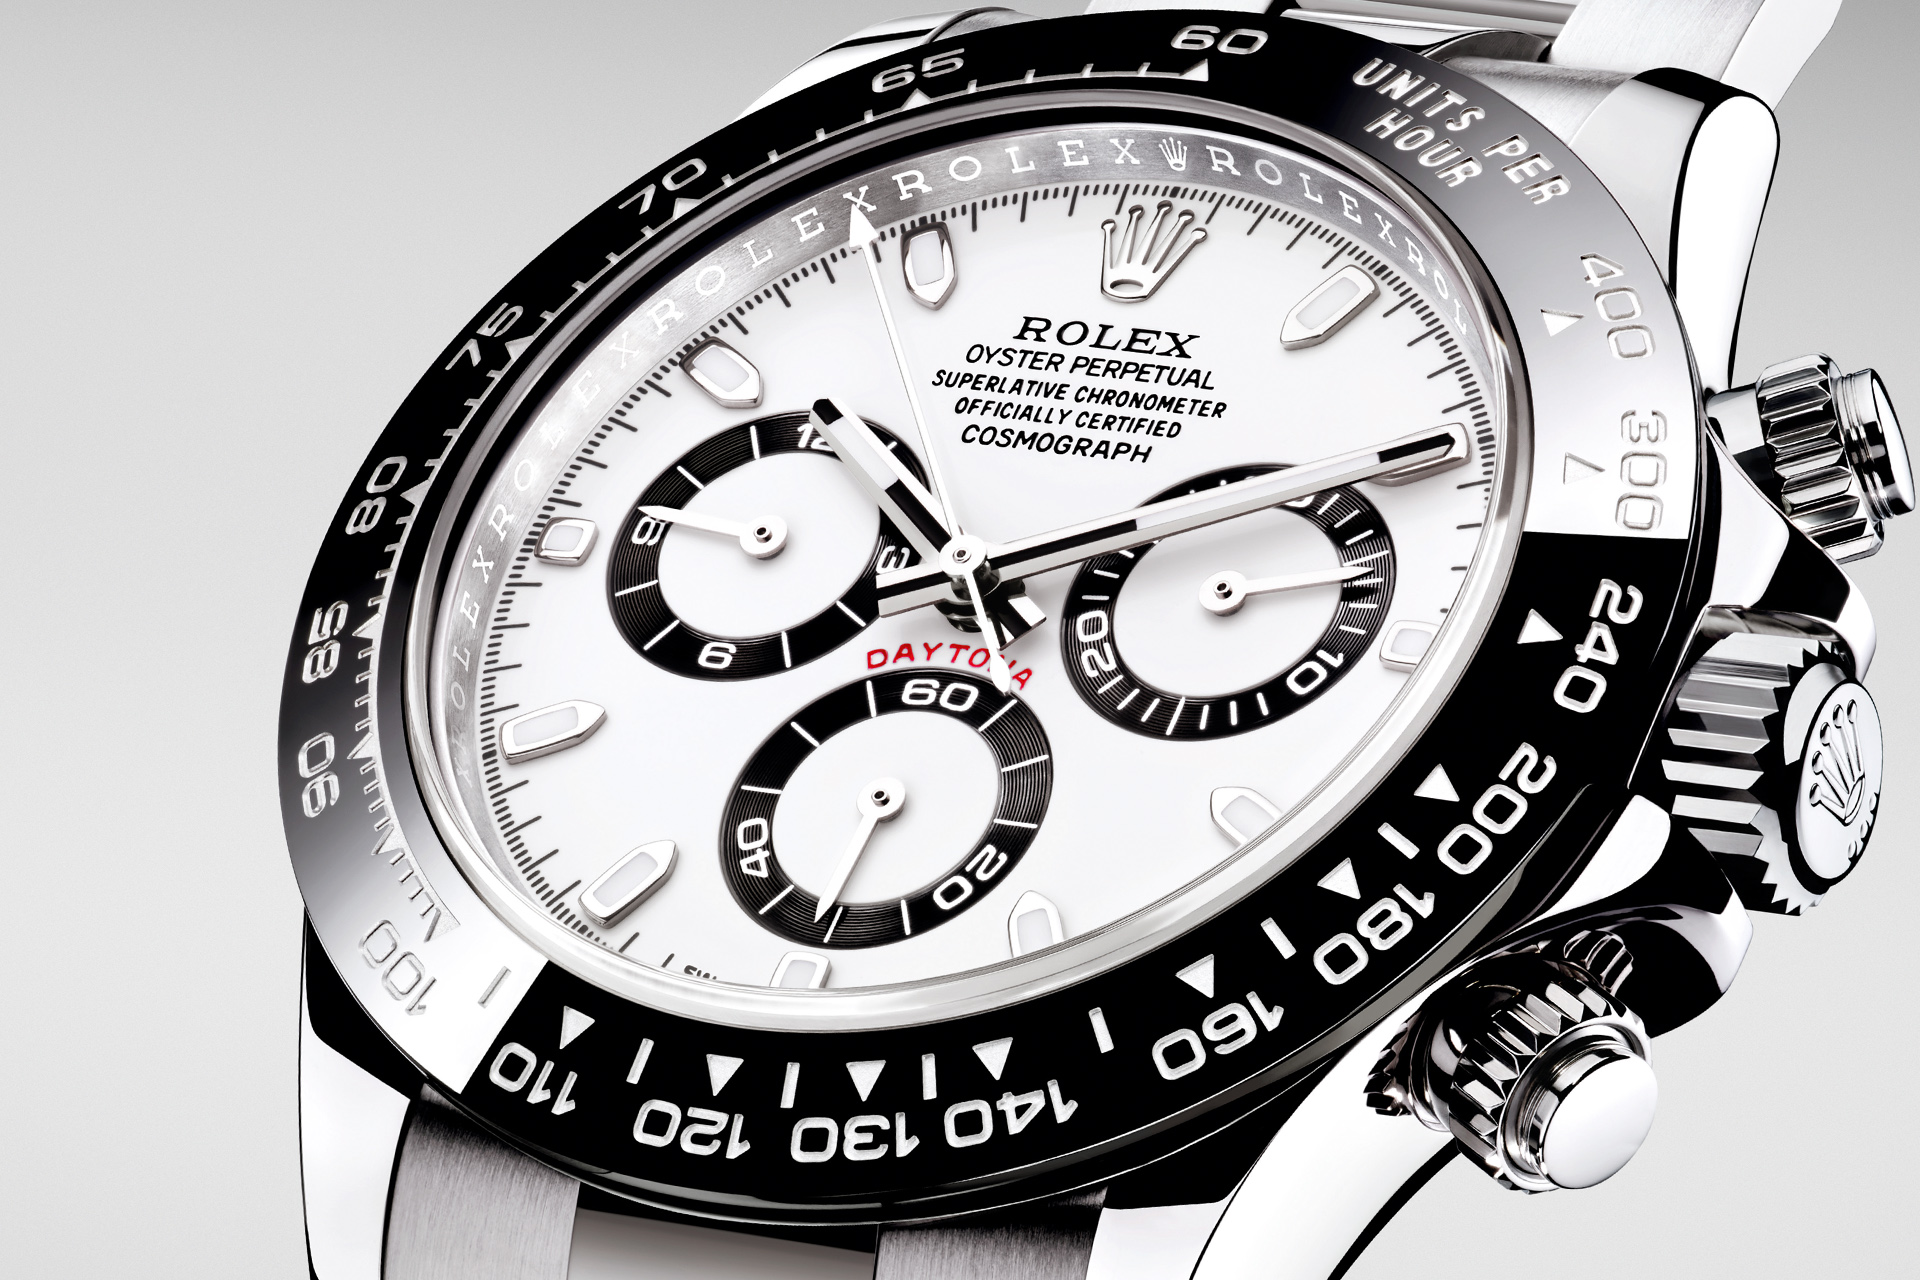 1920x1280 Rolex High Quality Replica Watches Uk, Cheap Classical Swiss